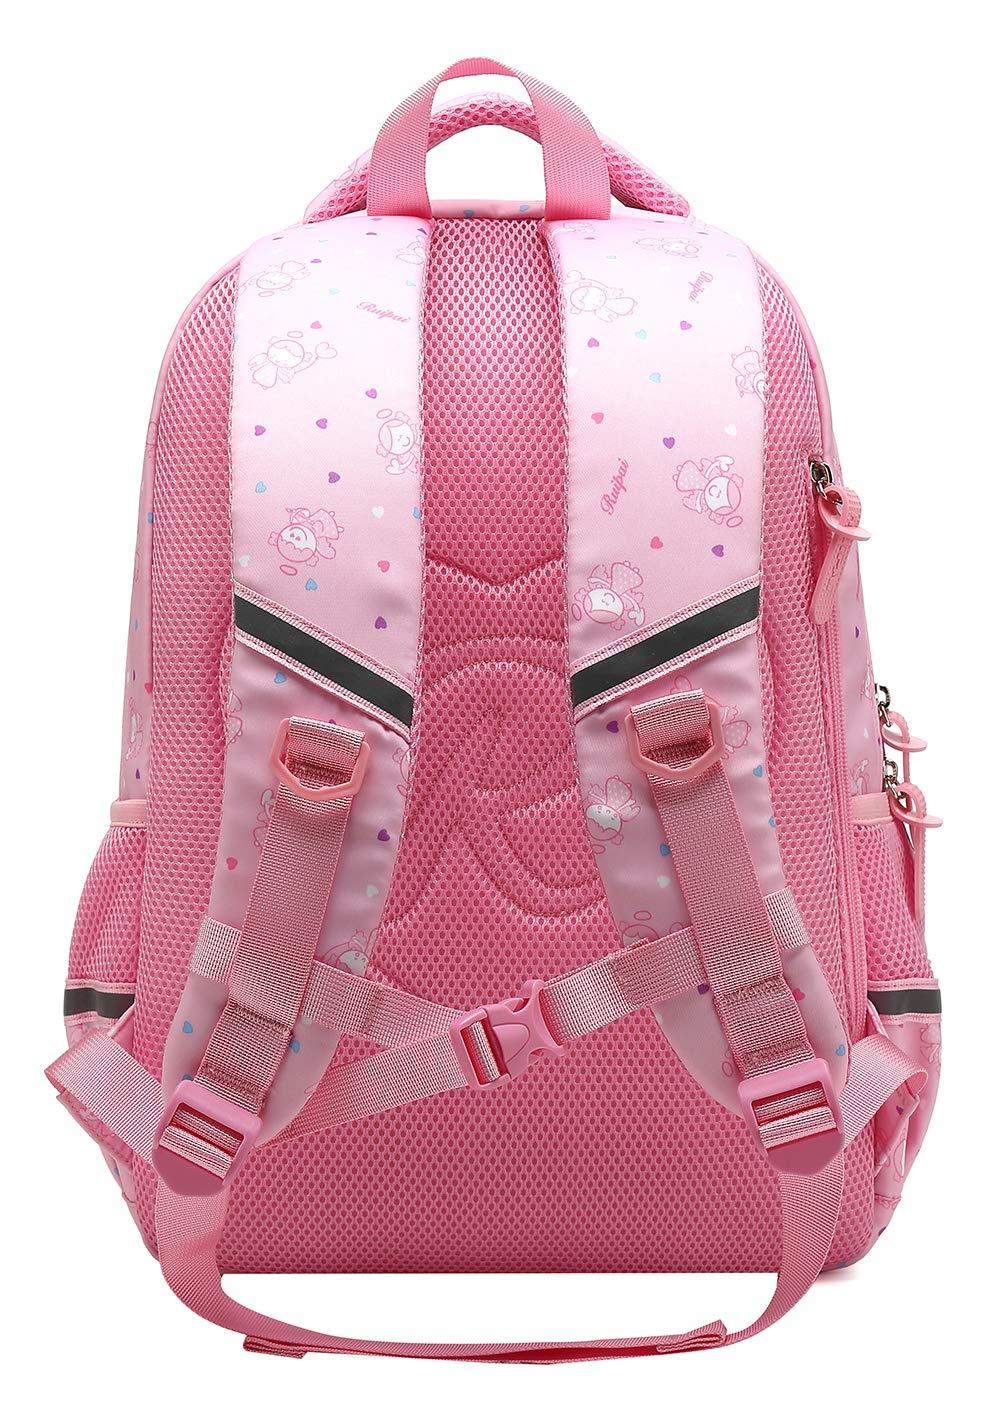 71iYKv94dXL - SellerFun UKXB106 - Mochila Infantil Niños, 22 L Style B Pink (Rosa) - UKXB426E1